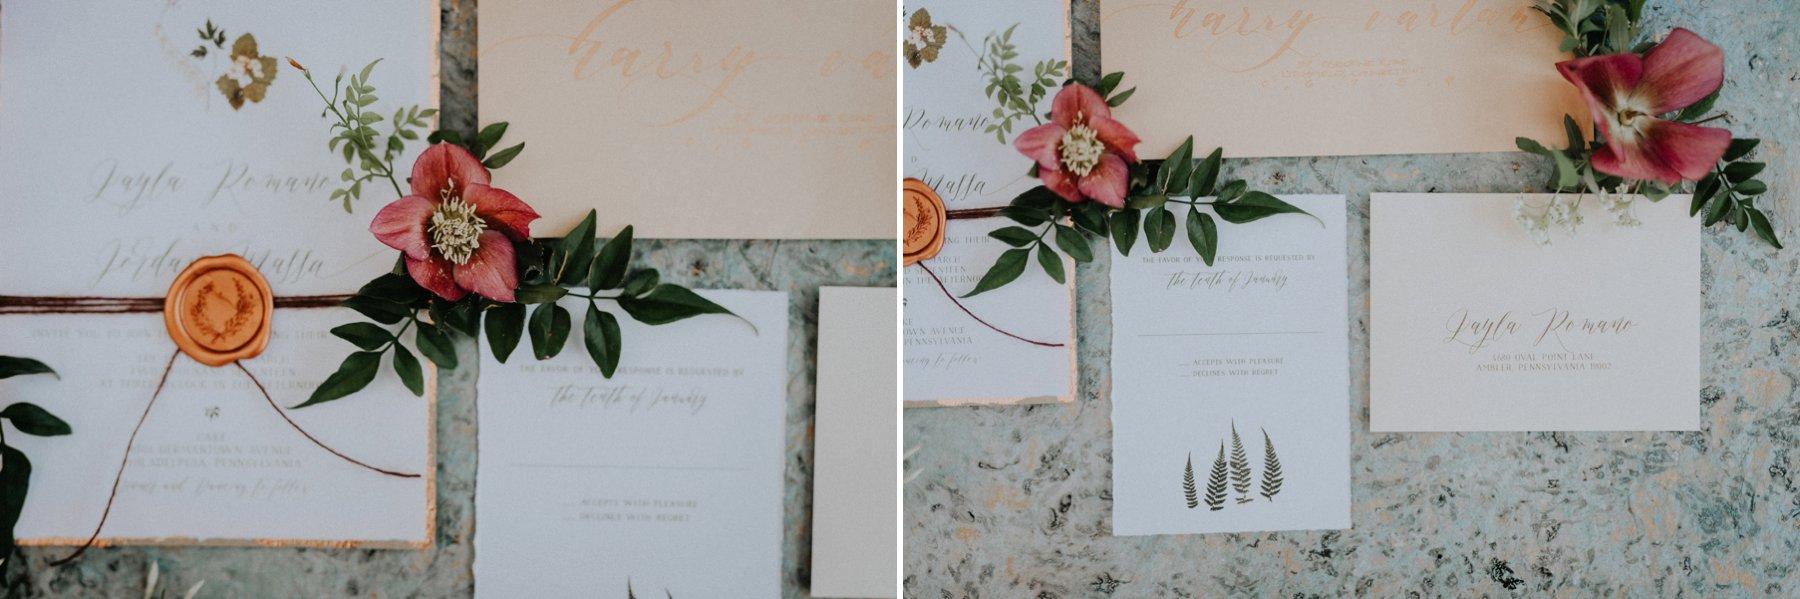 greenhouse-botanical-wedding-2.jpg